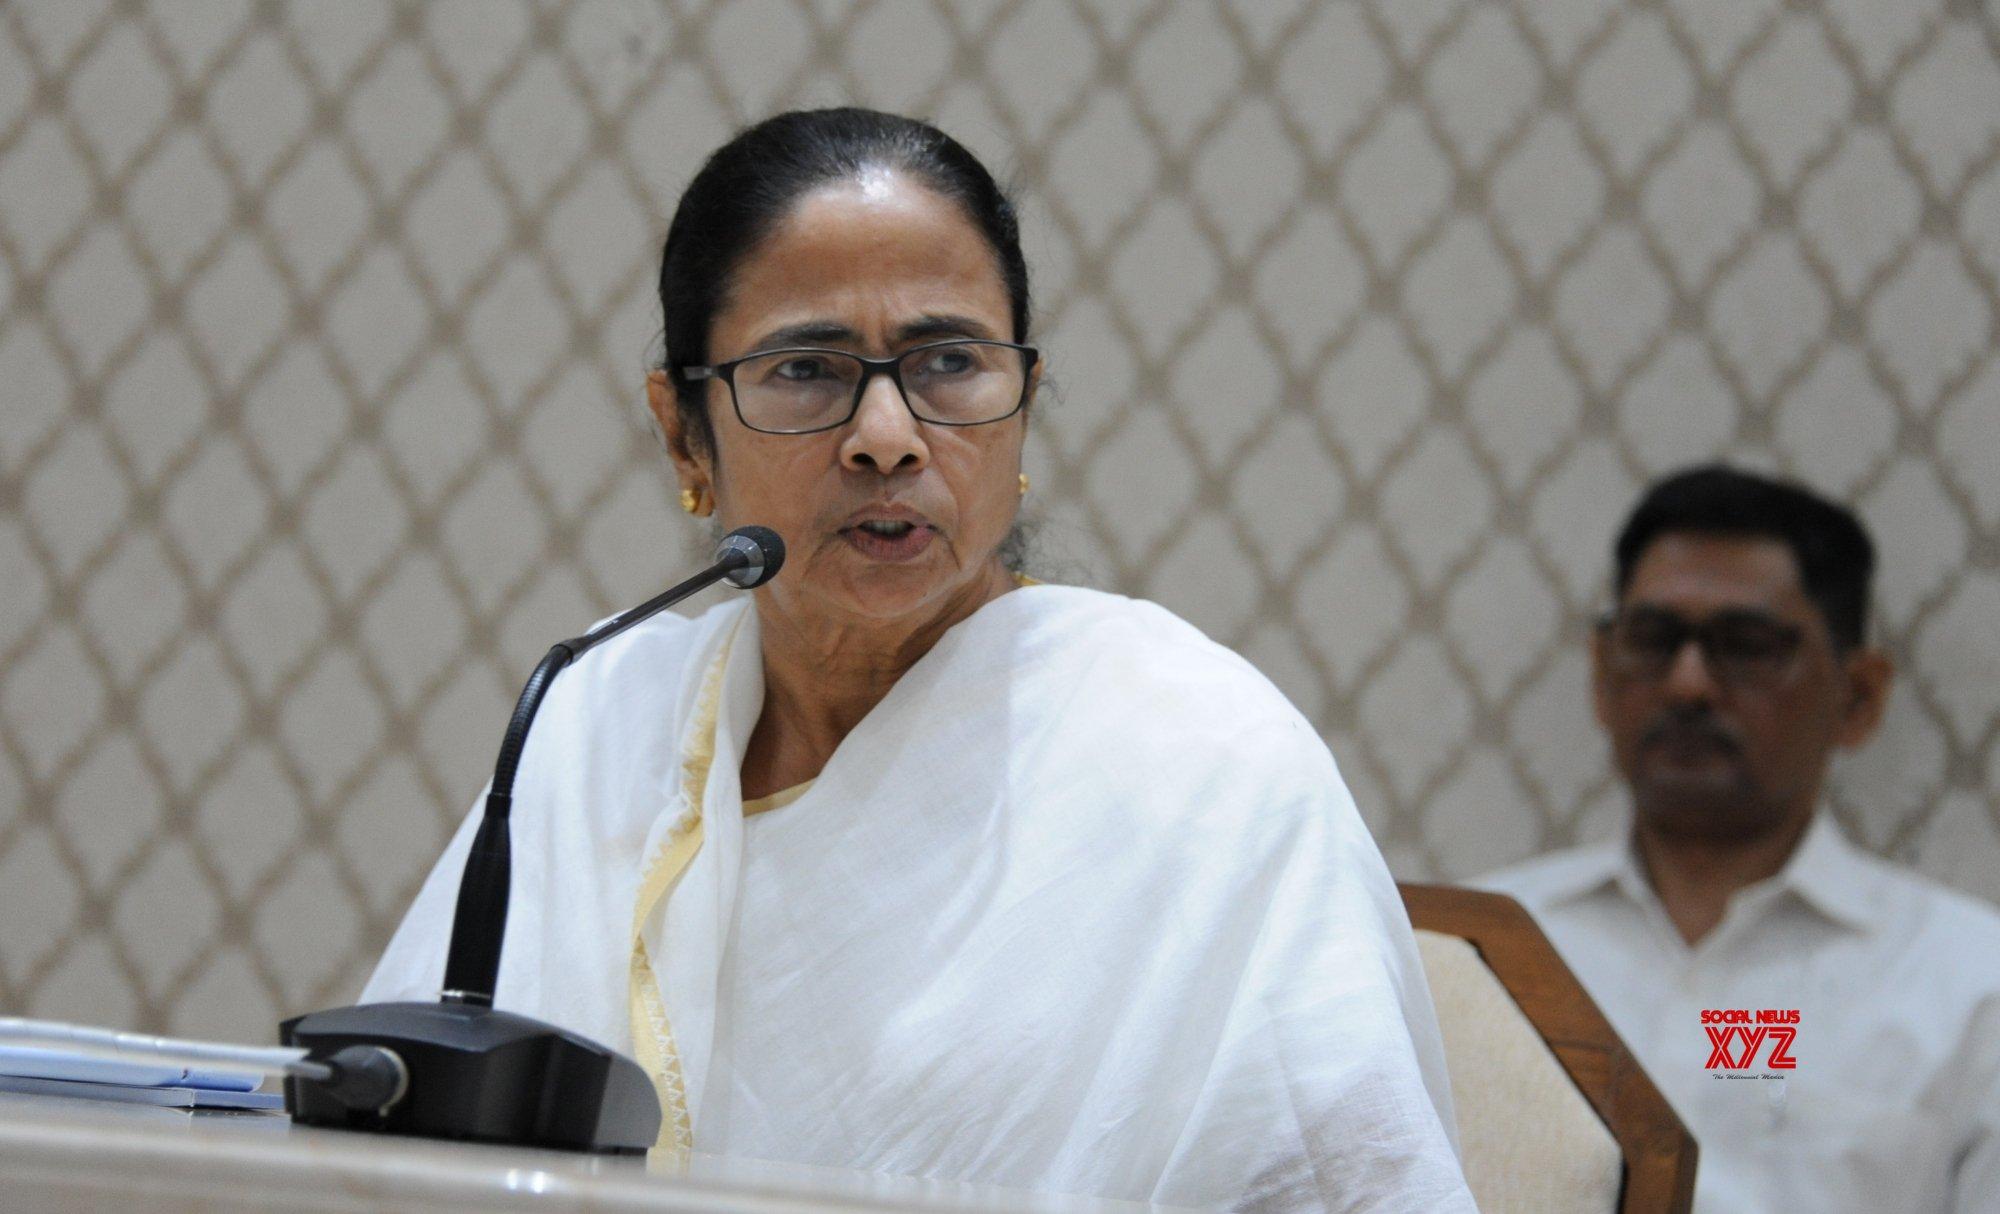 Don't allow fundamentalists' meetings, Mamata tells police